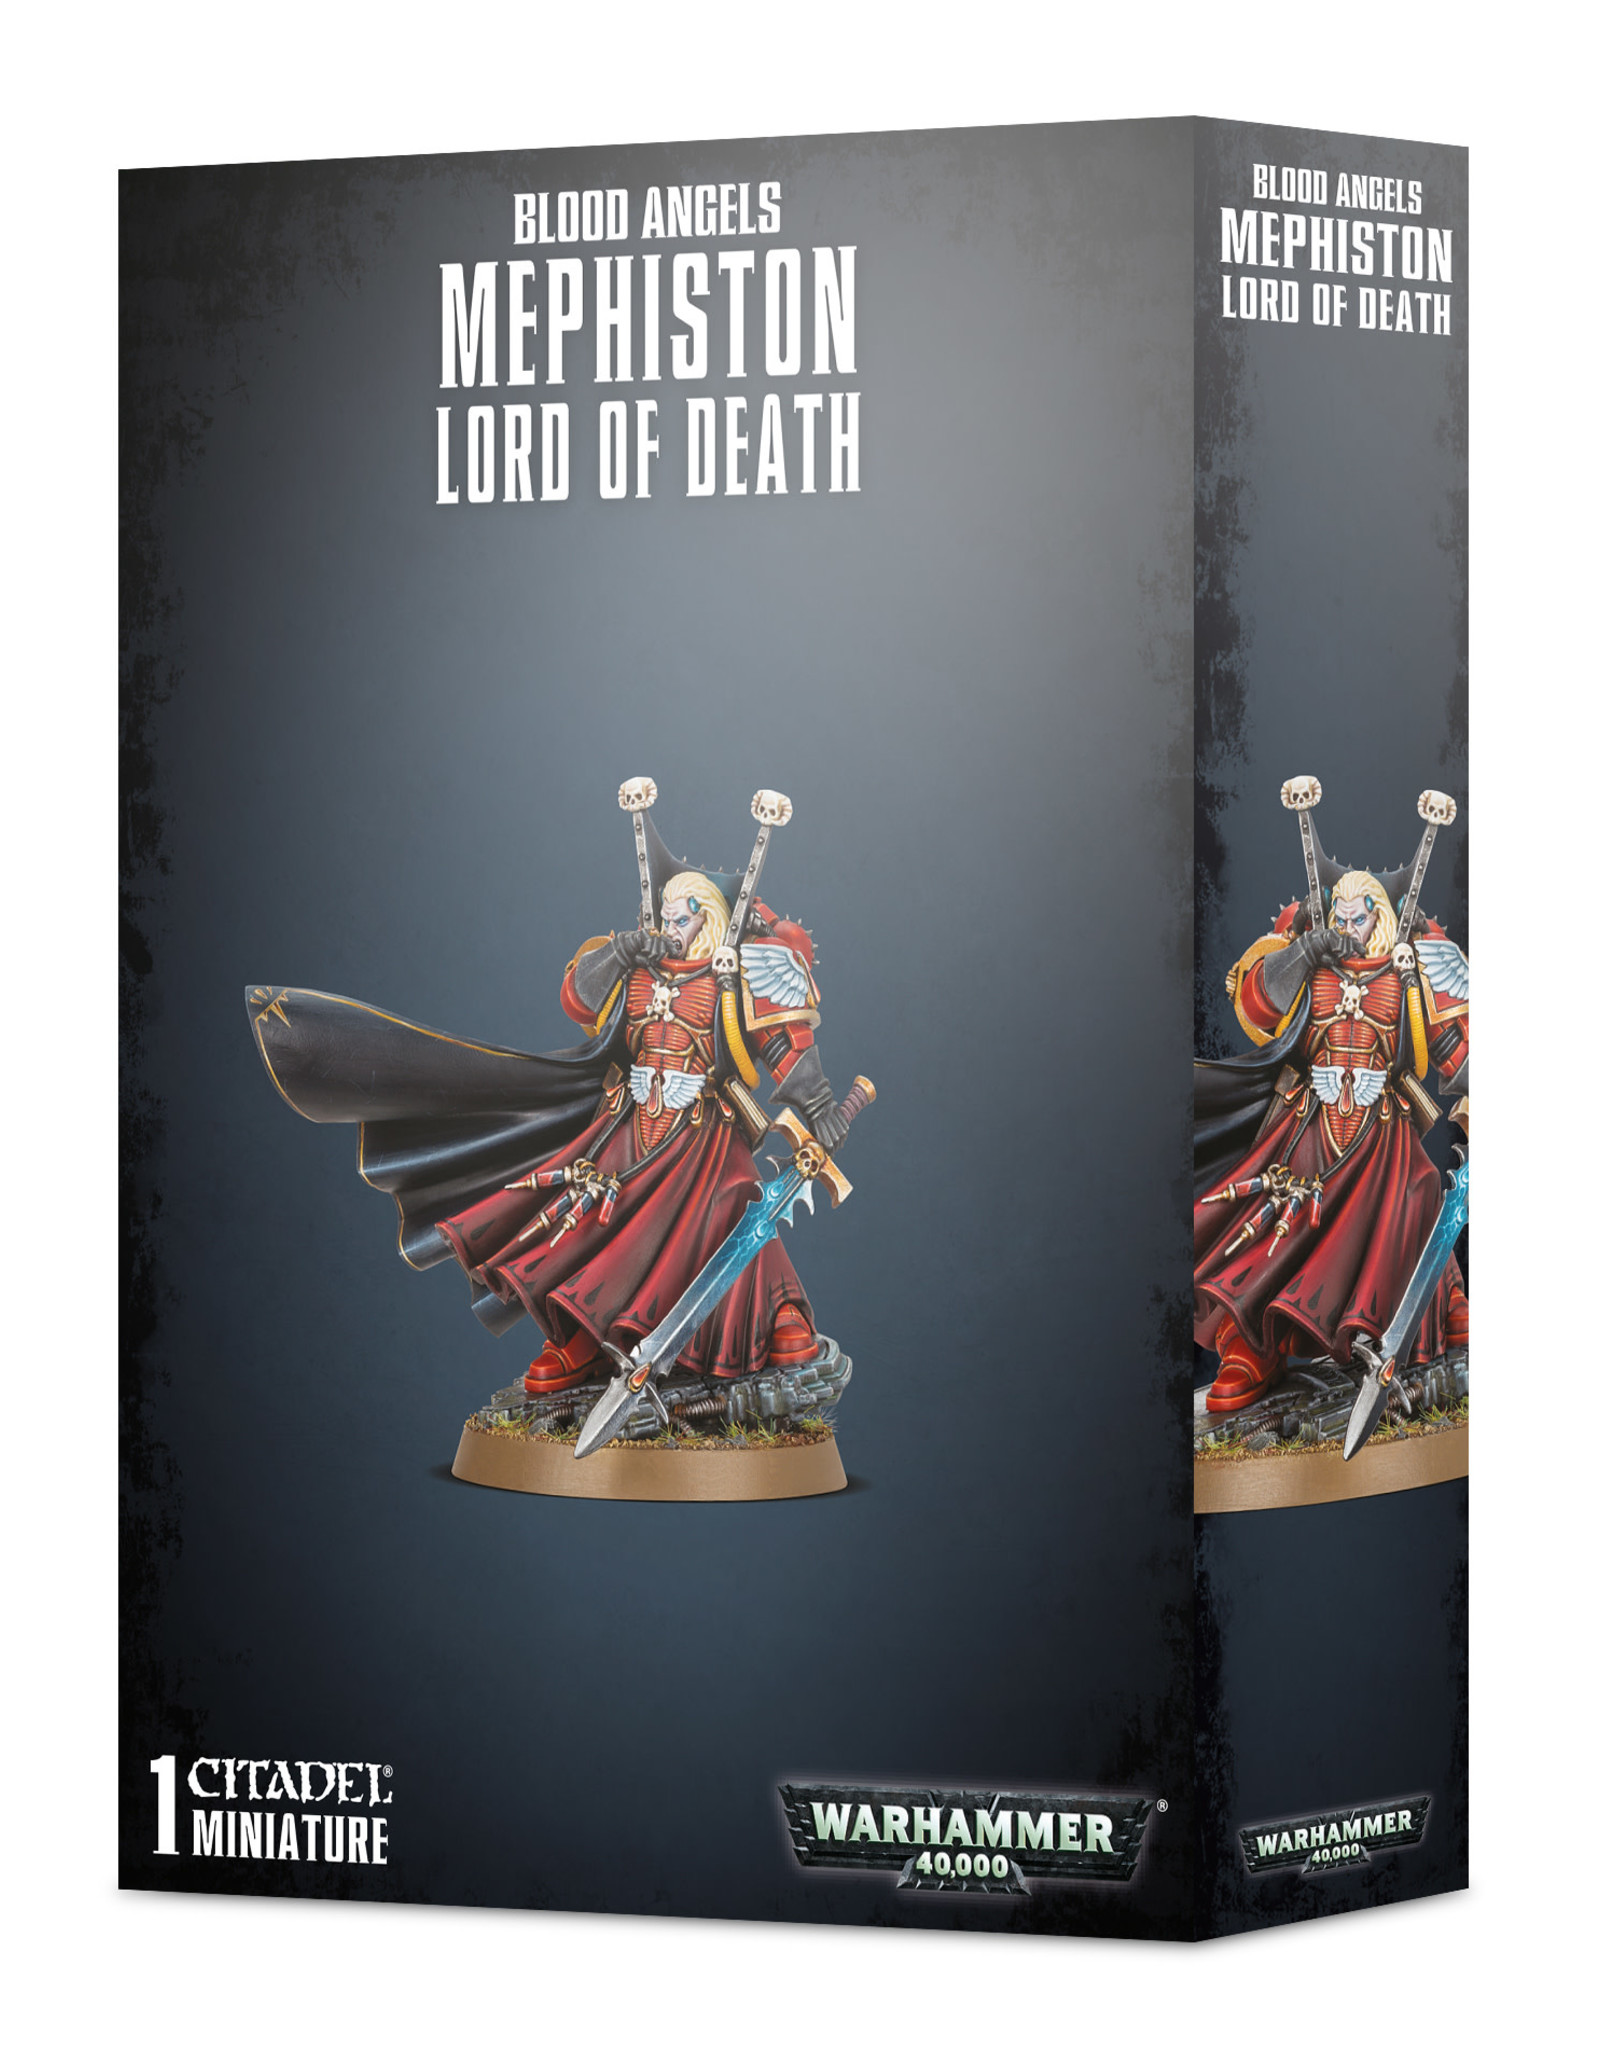 Warhammer 40K Blood Angels Mephiston Lord of Death